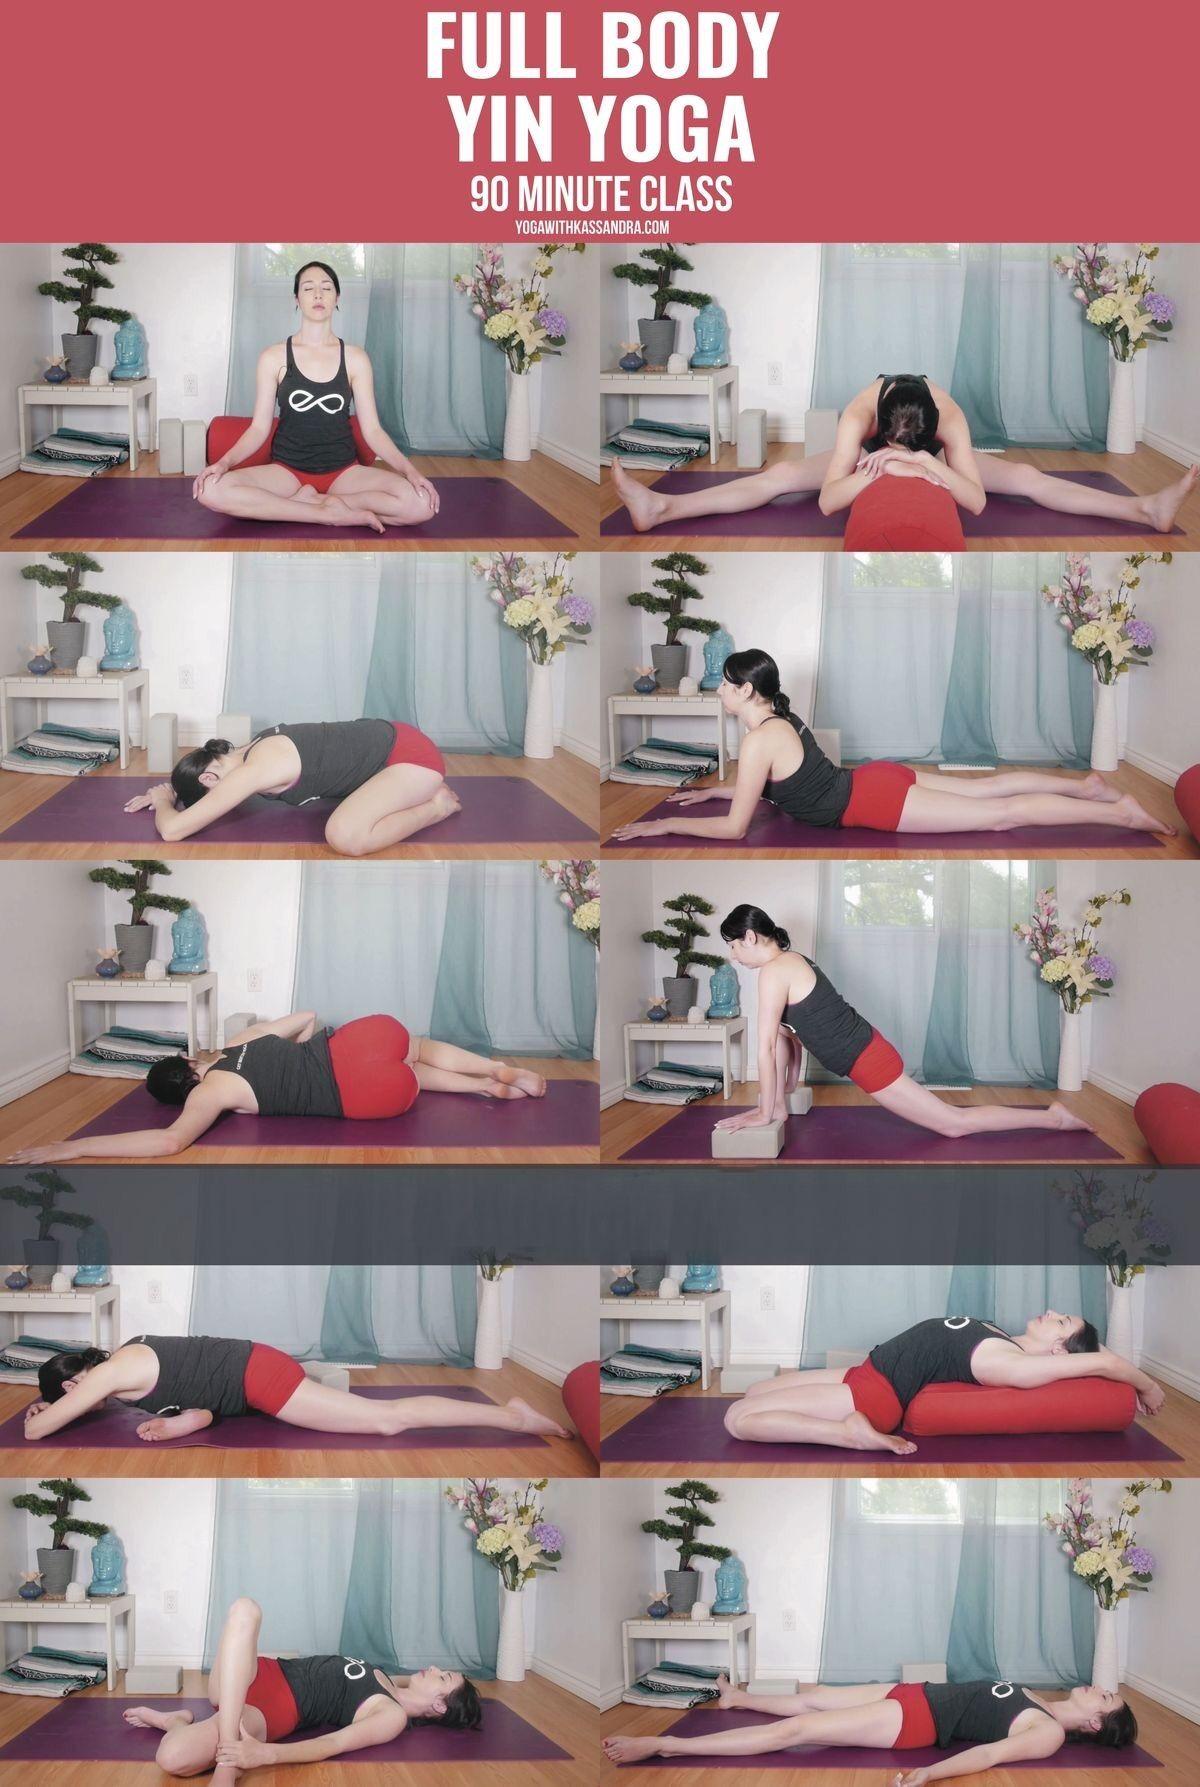 Yin Yoga 90 Minute Class The Poses Yin Yoga Sequence Yin Yoga Yin Yoga Poses